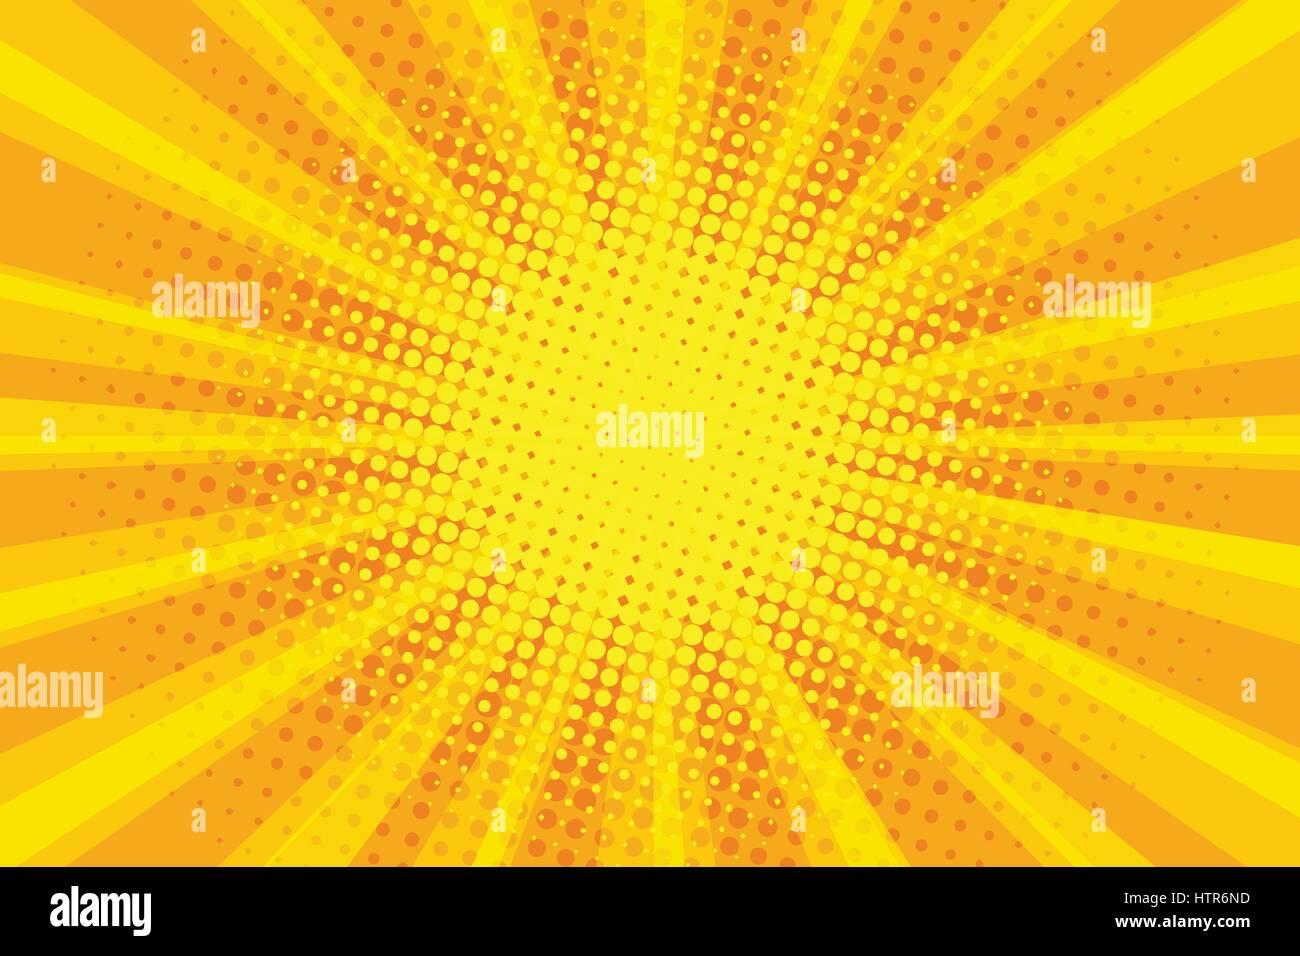 yellow orange sun pop art retro rays background - Stock Image